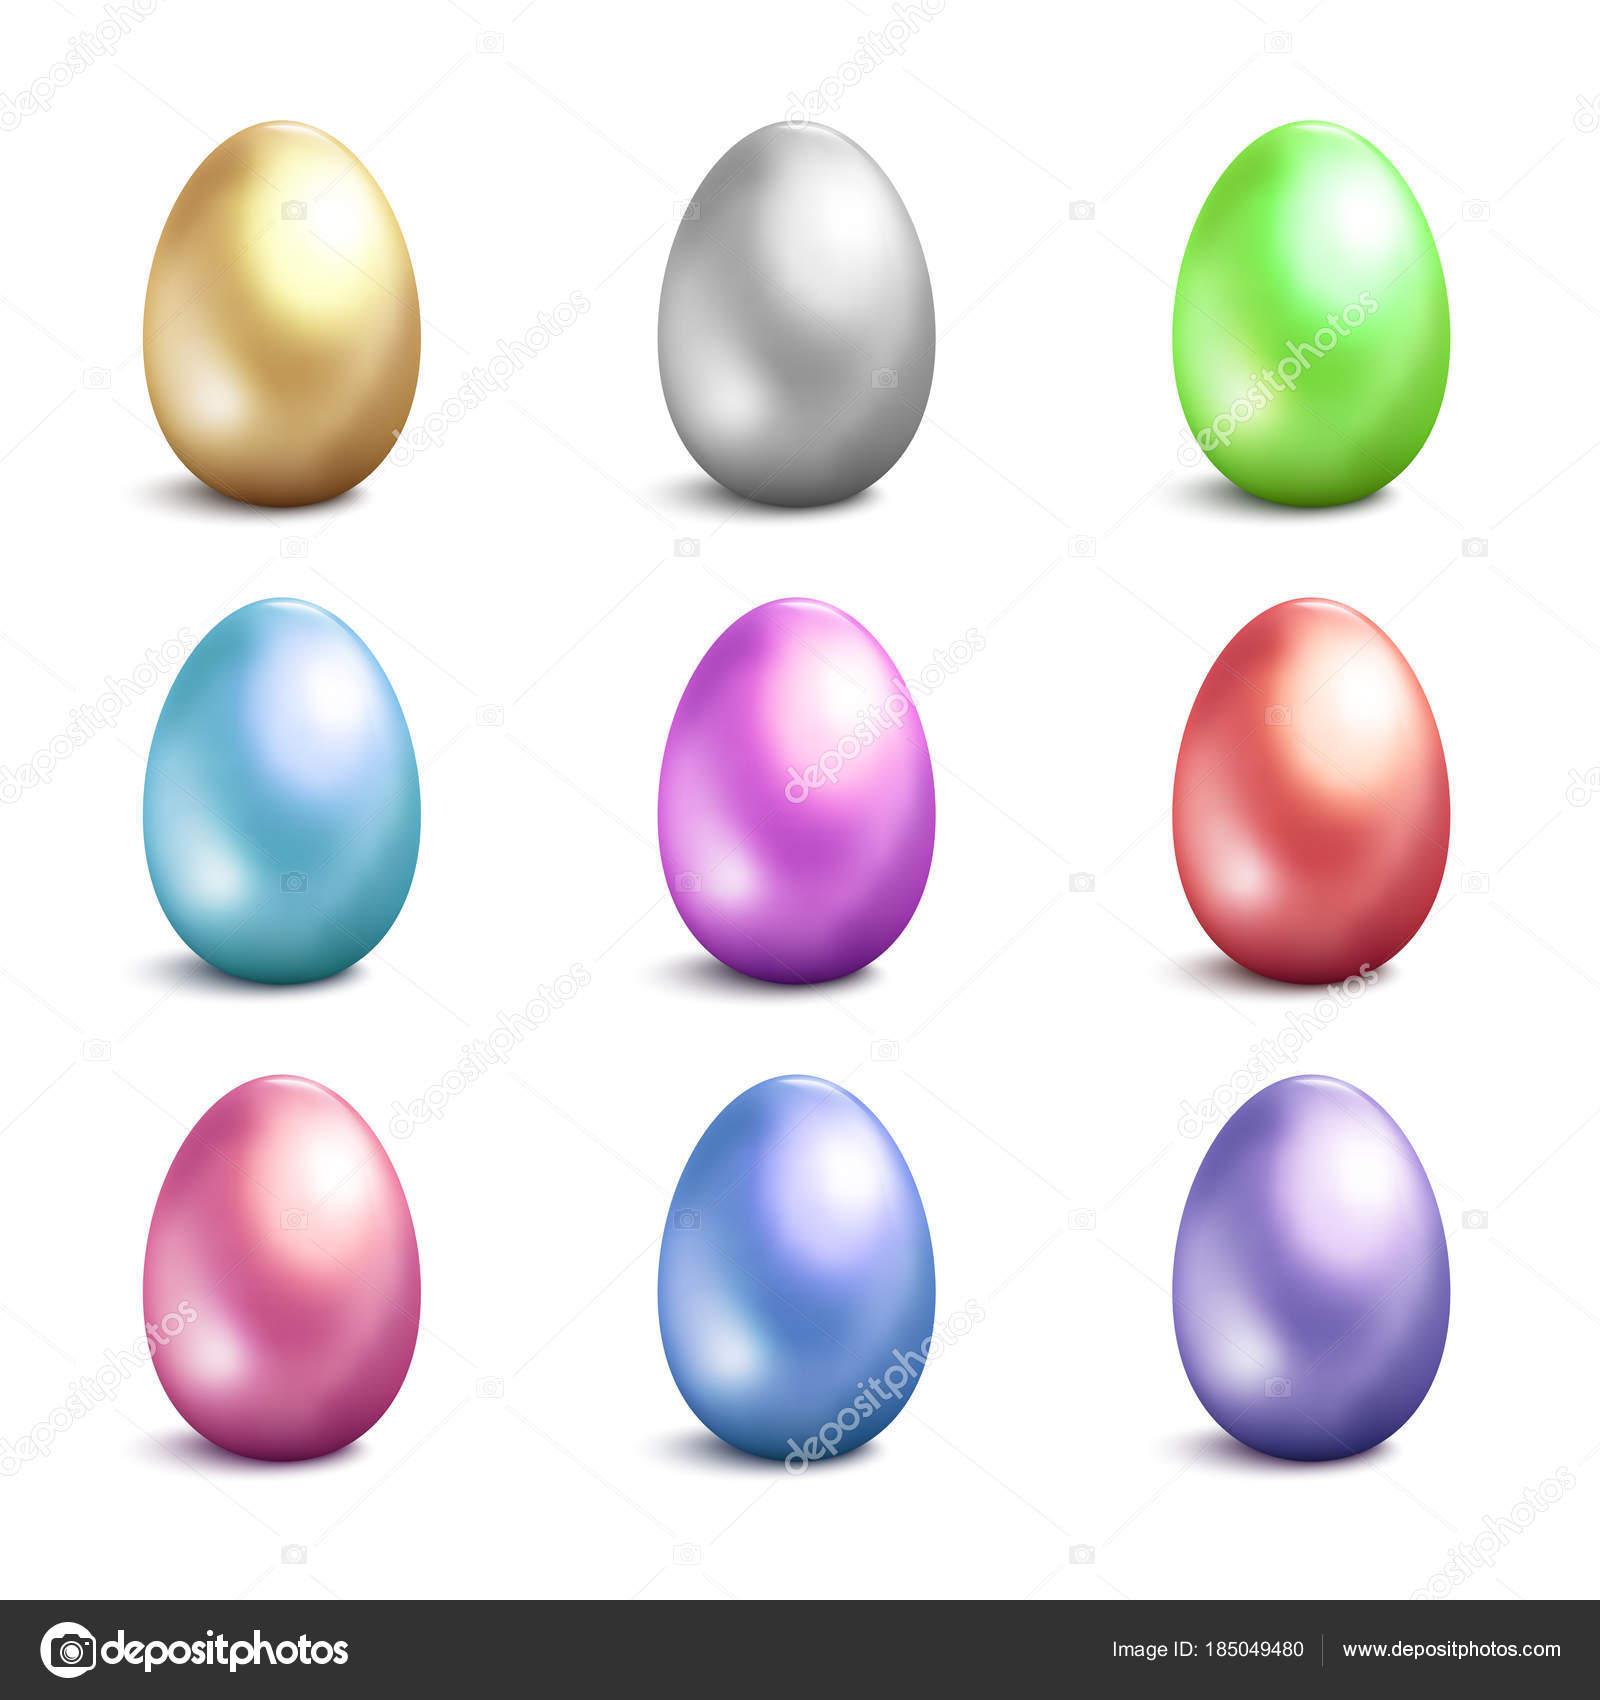 Huevos de Pascua de vectores iconos. Vector aislado de huevos de ...